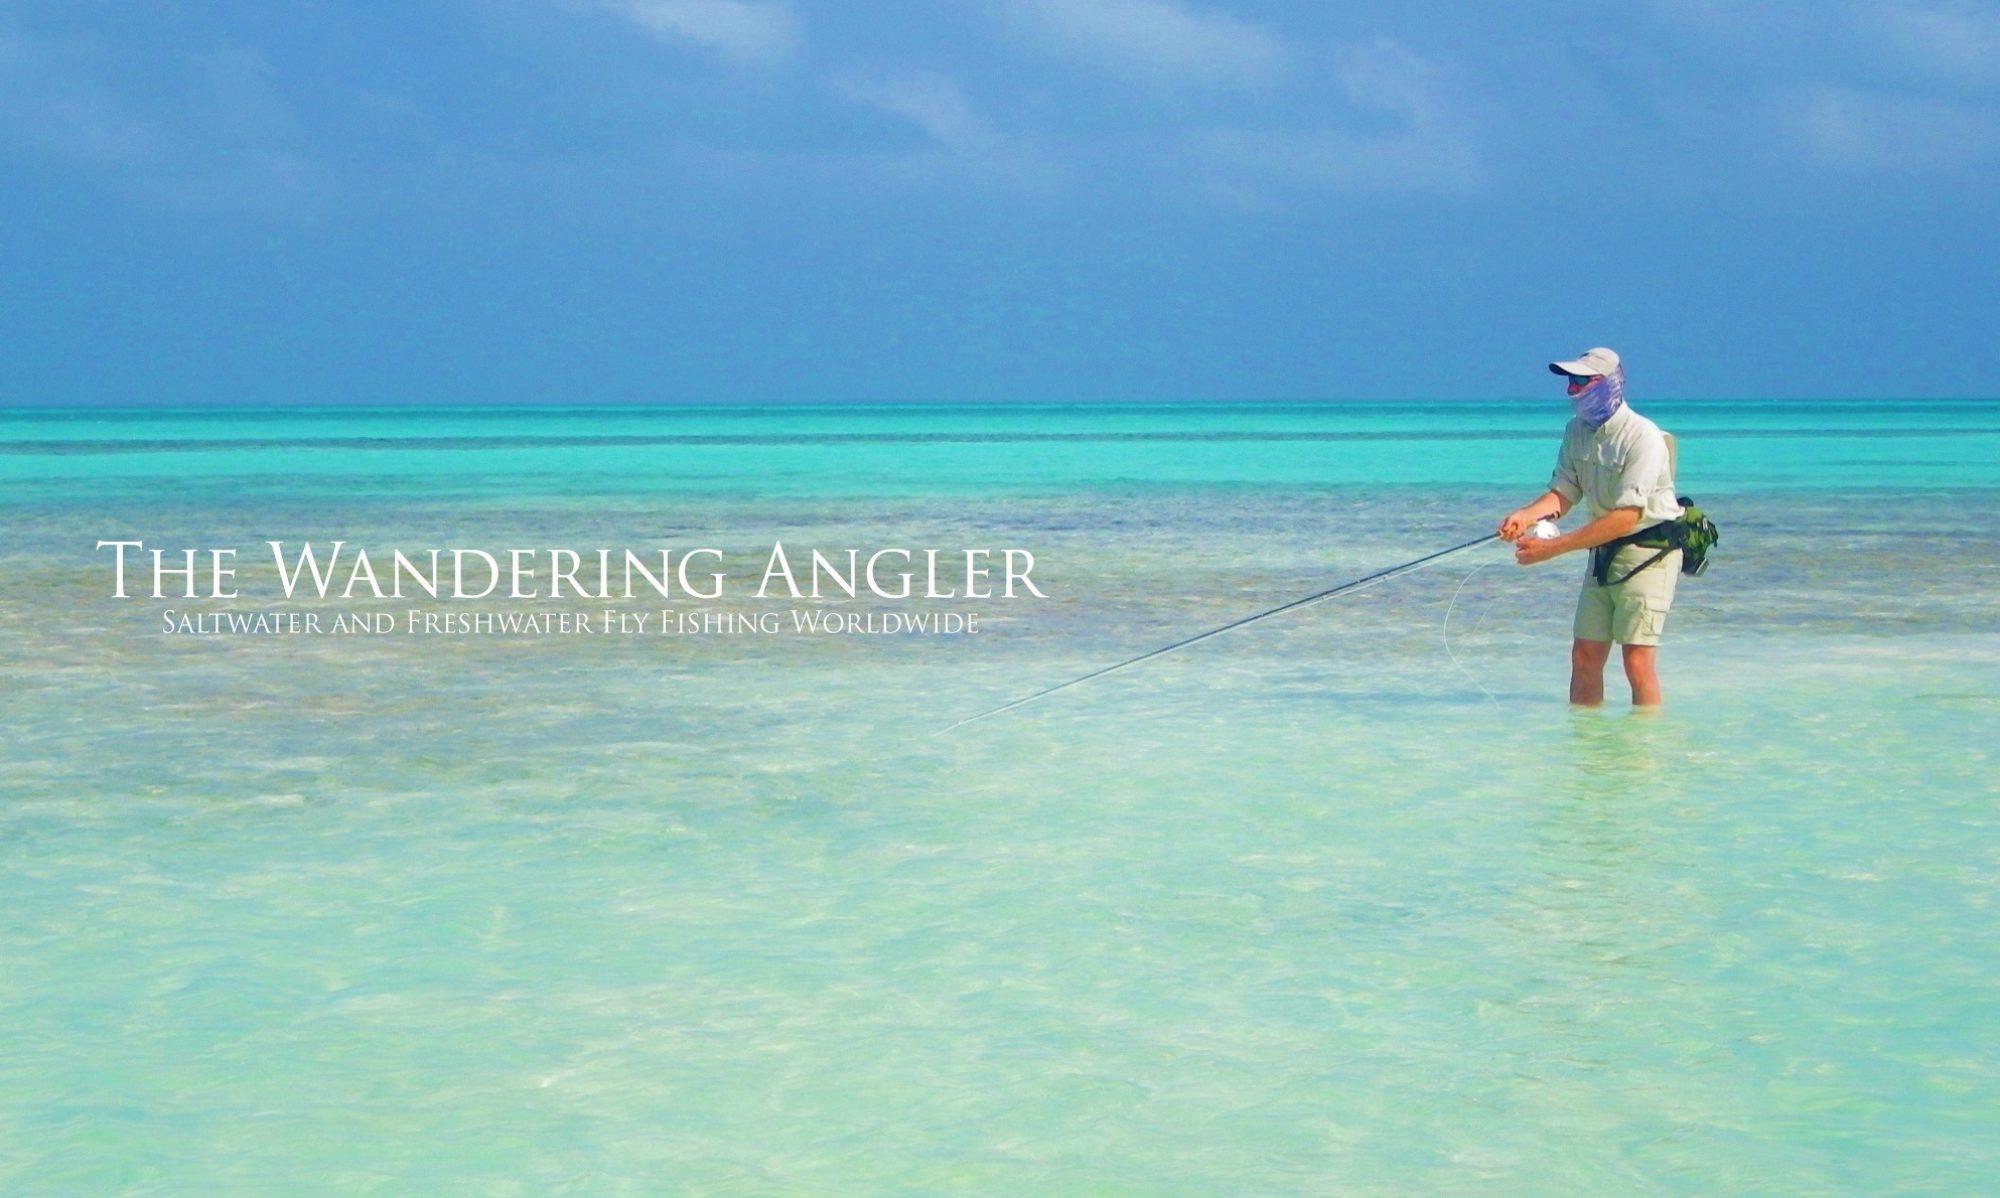 The Wandering Angler